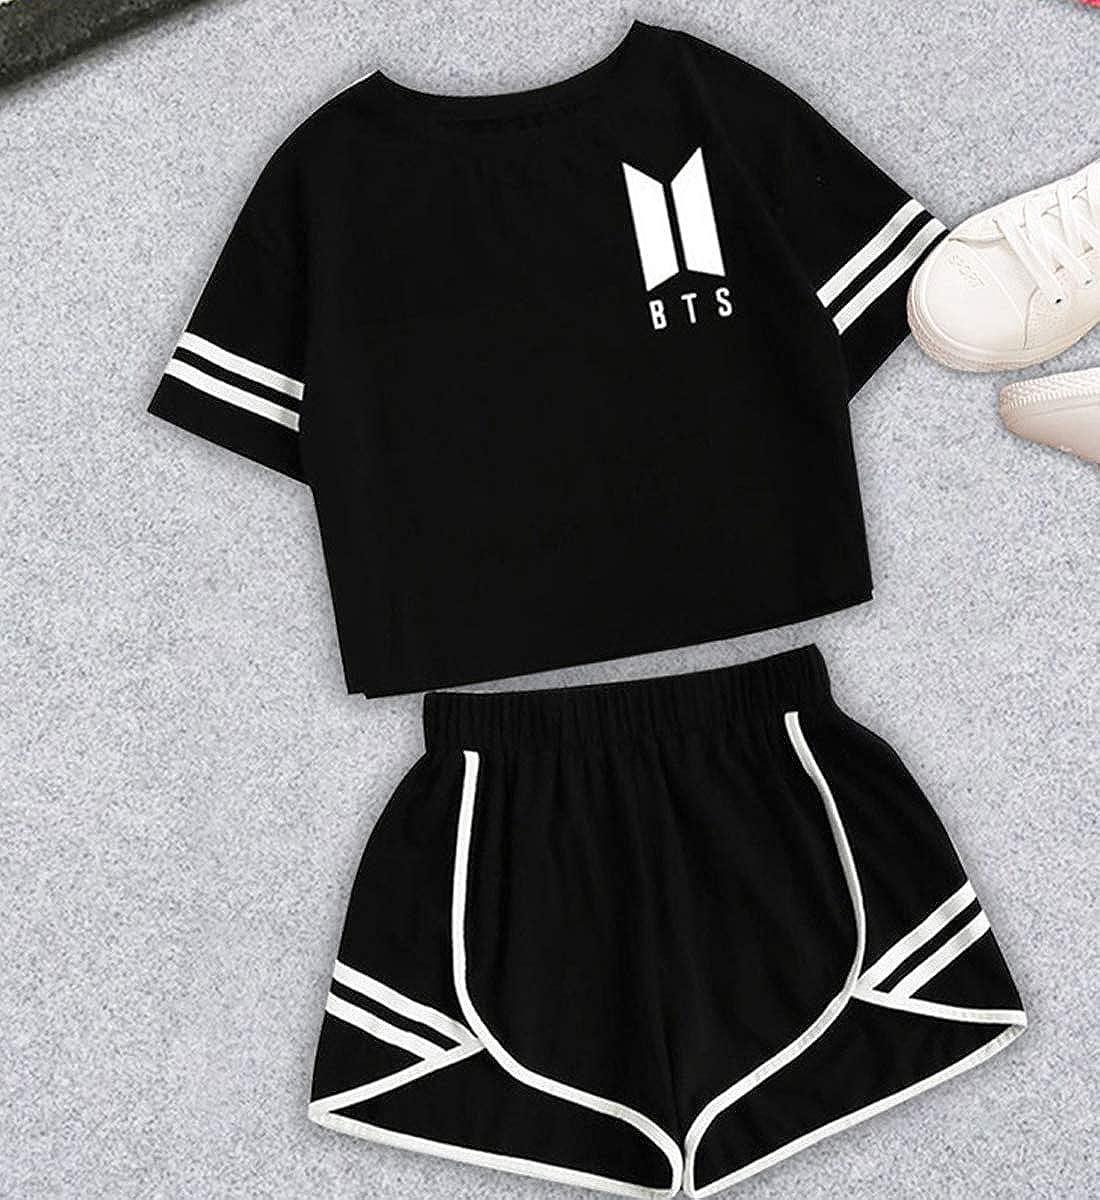 JIJUEMIU KPOP BTS Crop Top /& Shorts Set Damen BTS Bangtan Boys Tshirts Kurze Hosen Anzug Sommer Sportbekleidung Oberteile /& Jogginghose Sport Set